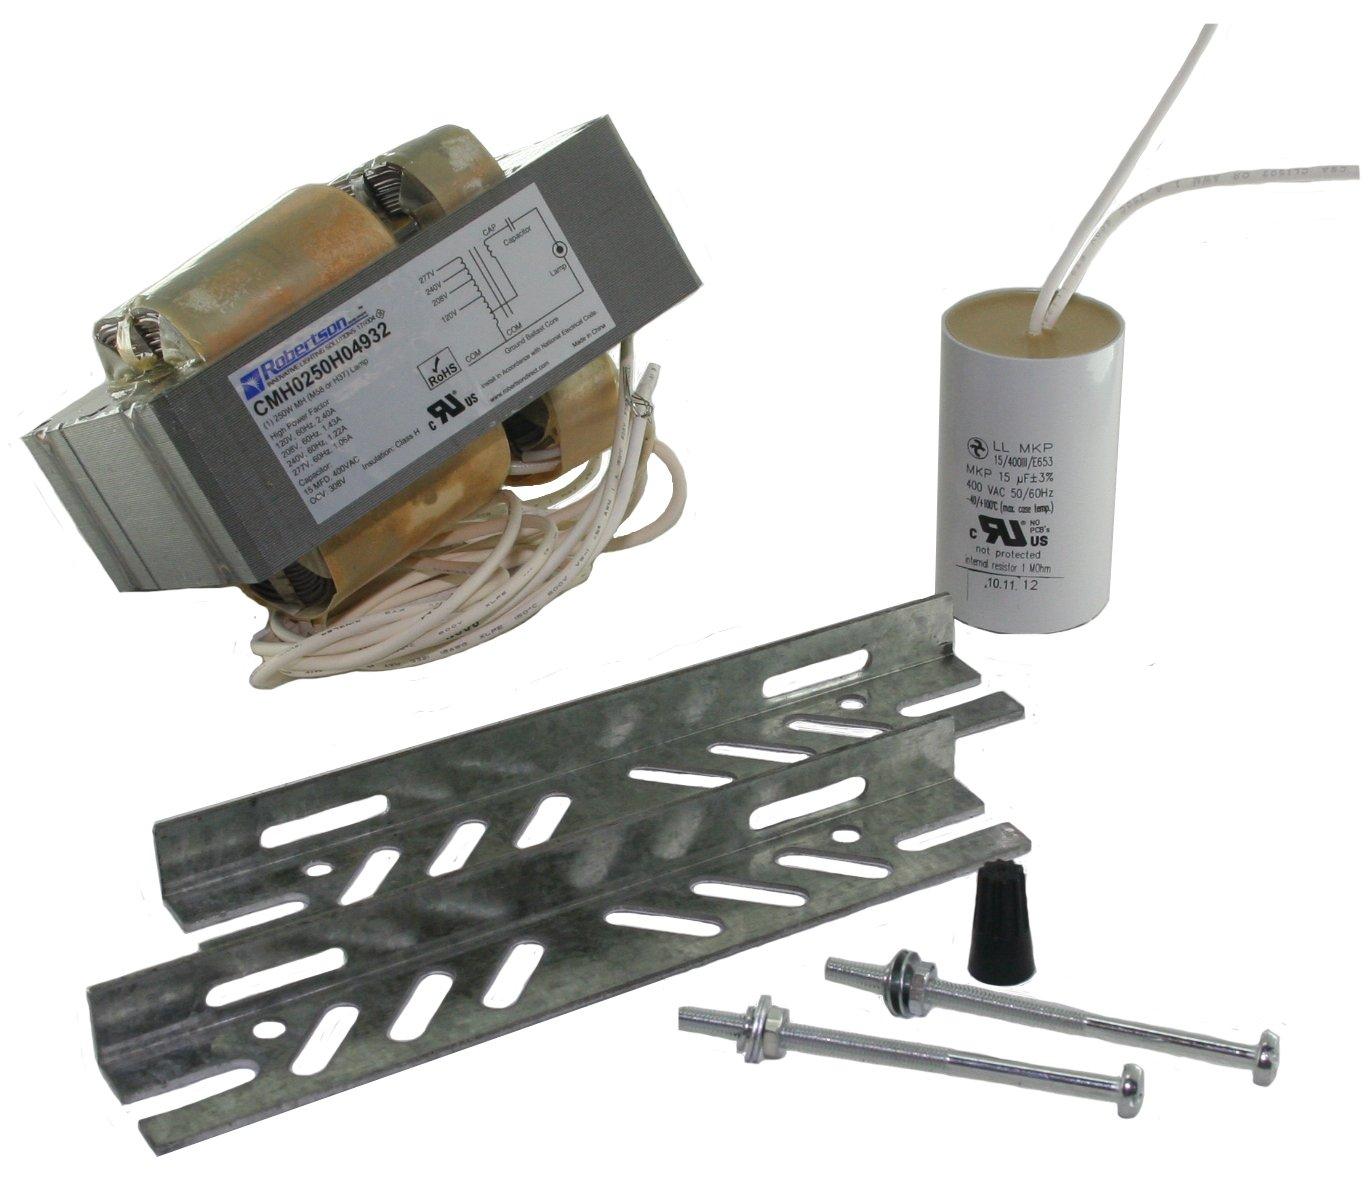 ROBERTSON 3P10065 Individual mHID, CWA, 250 Watt, M58 Metal Halide Lamp, 120/208/240/277Vac, 60Hz, Normal Ballast Factor, HPF, Model CMH0250H04932 M (Replaces CMH0250H04932)